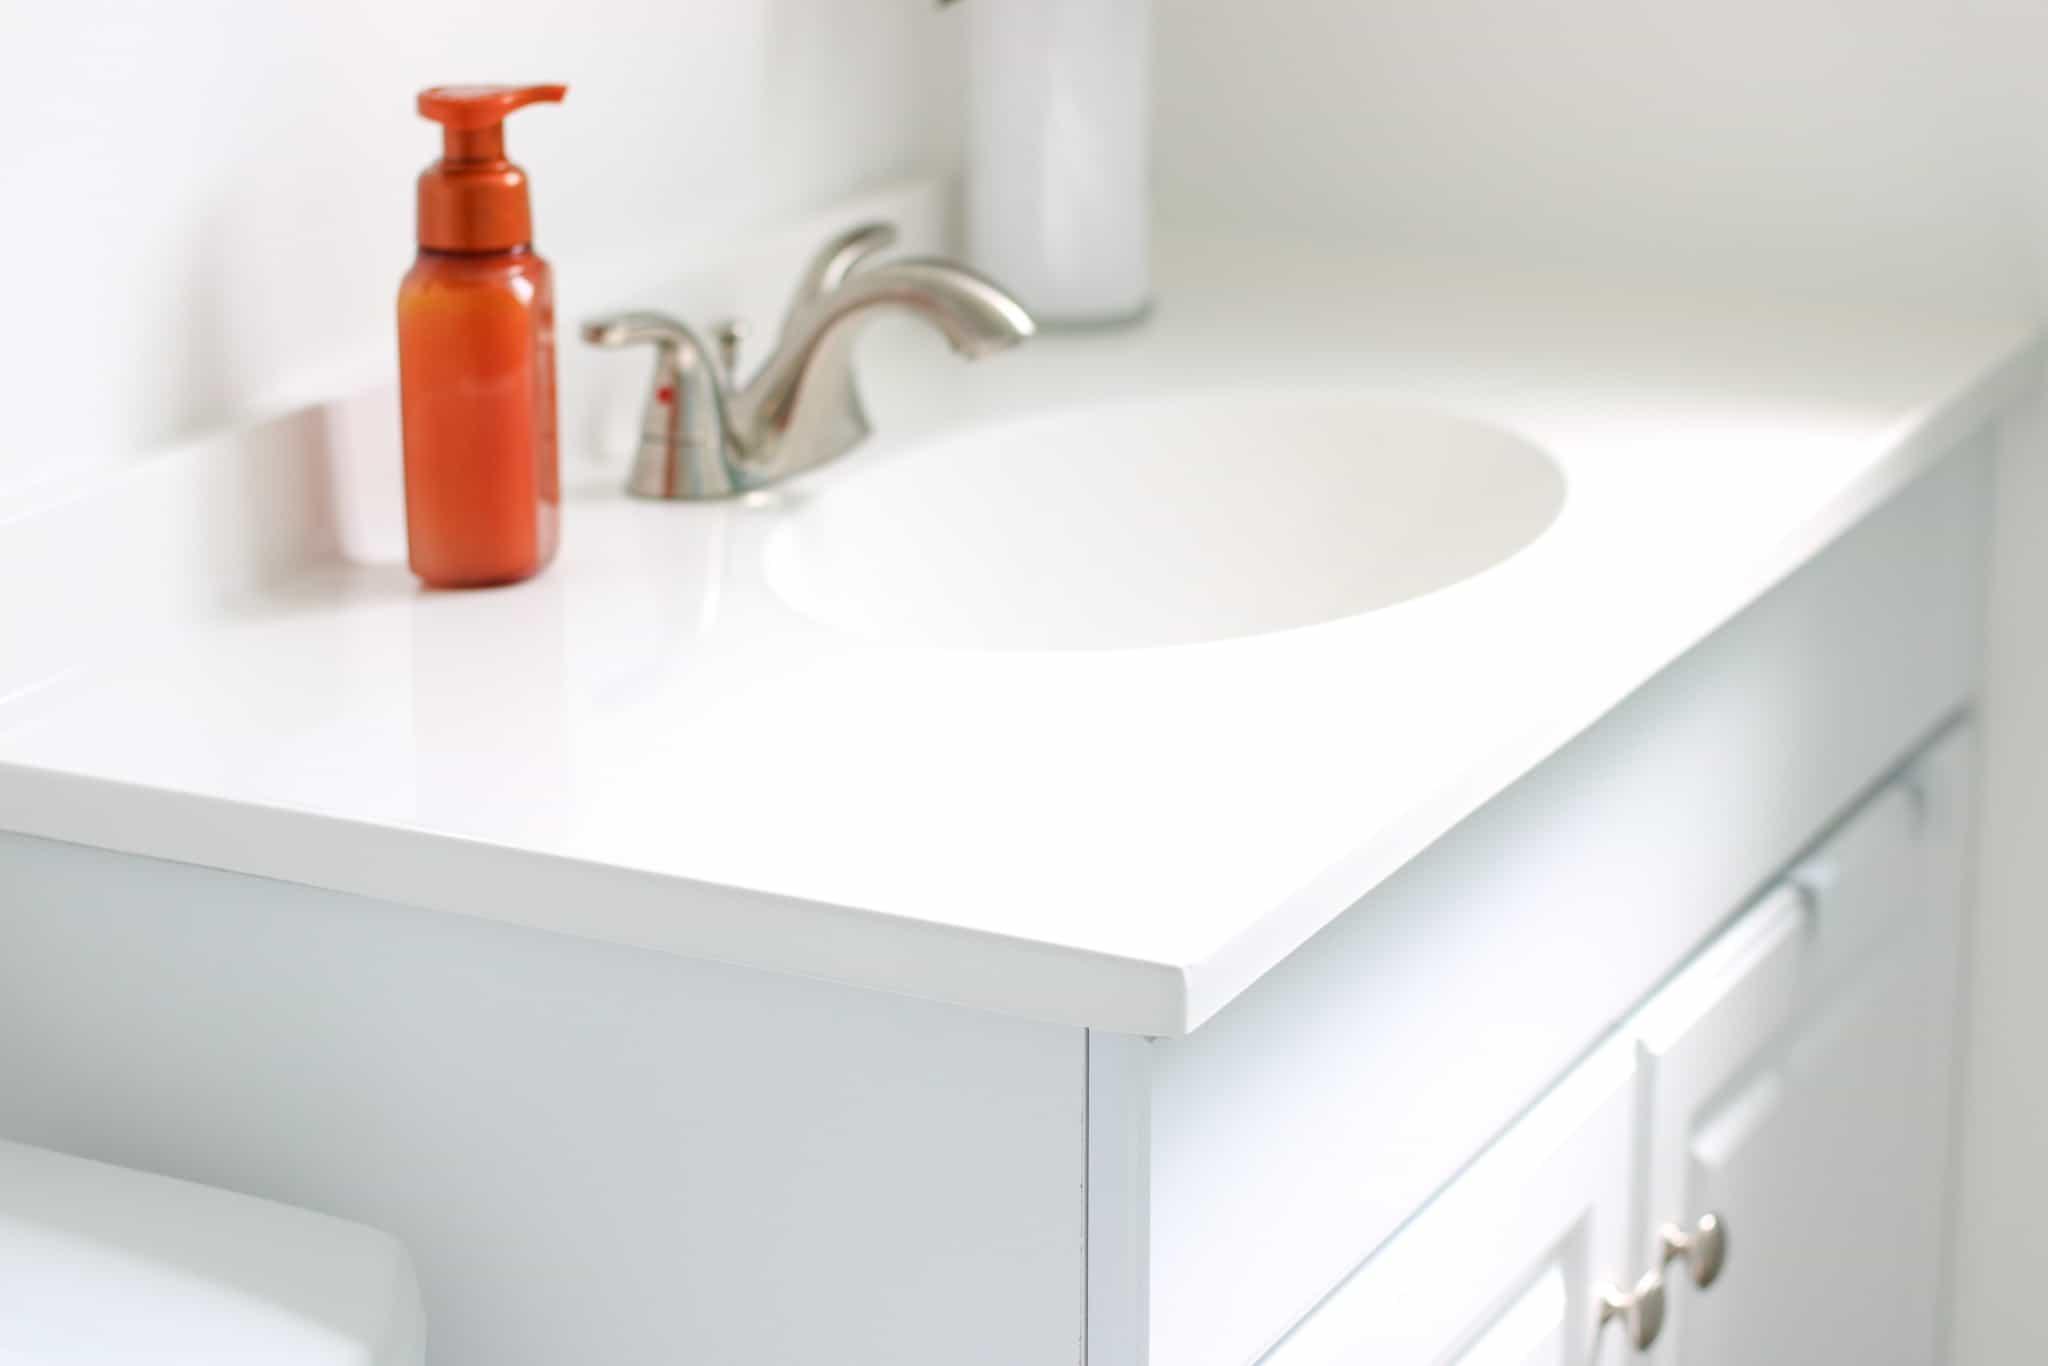 clean bathroom countertop and cupboard